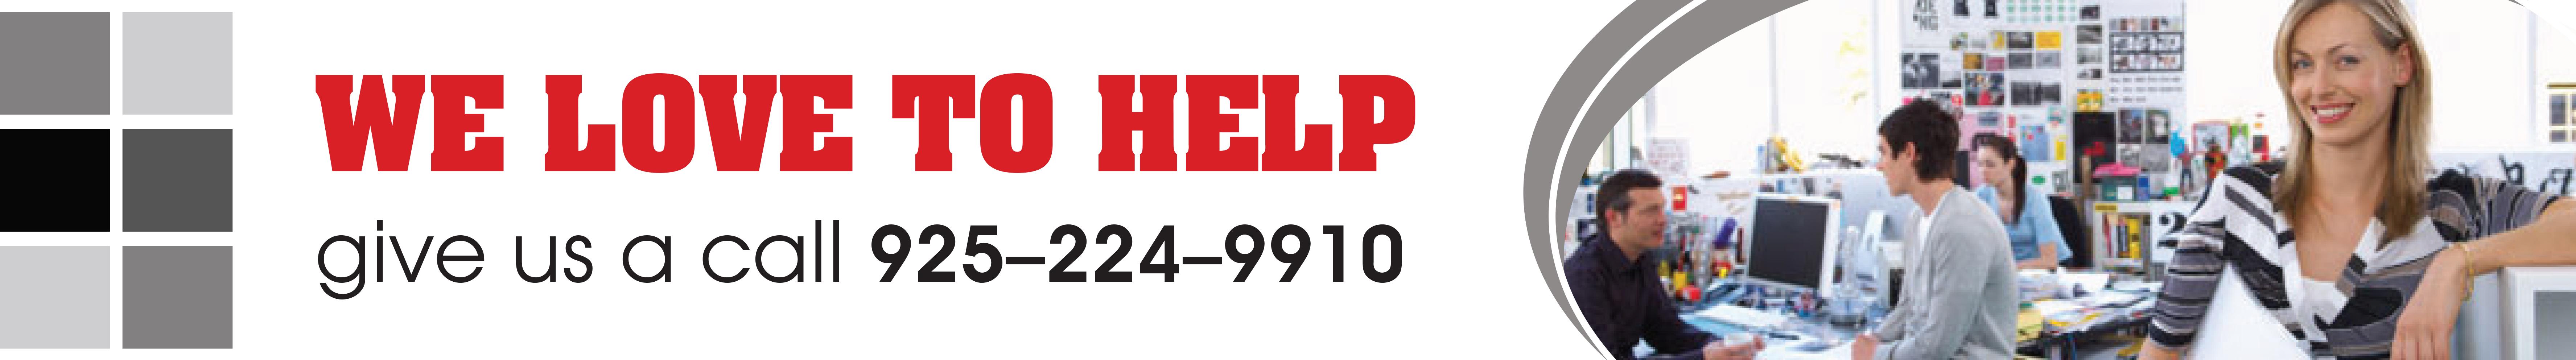 love to help